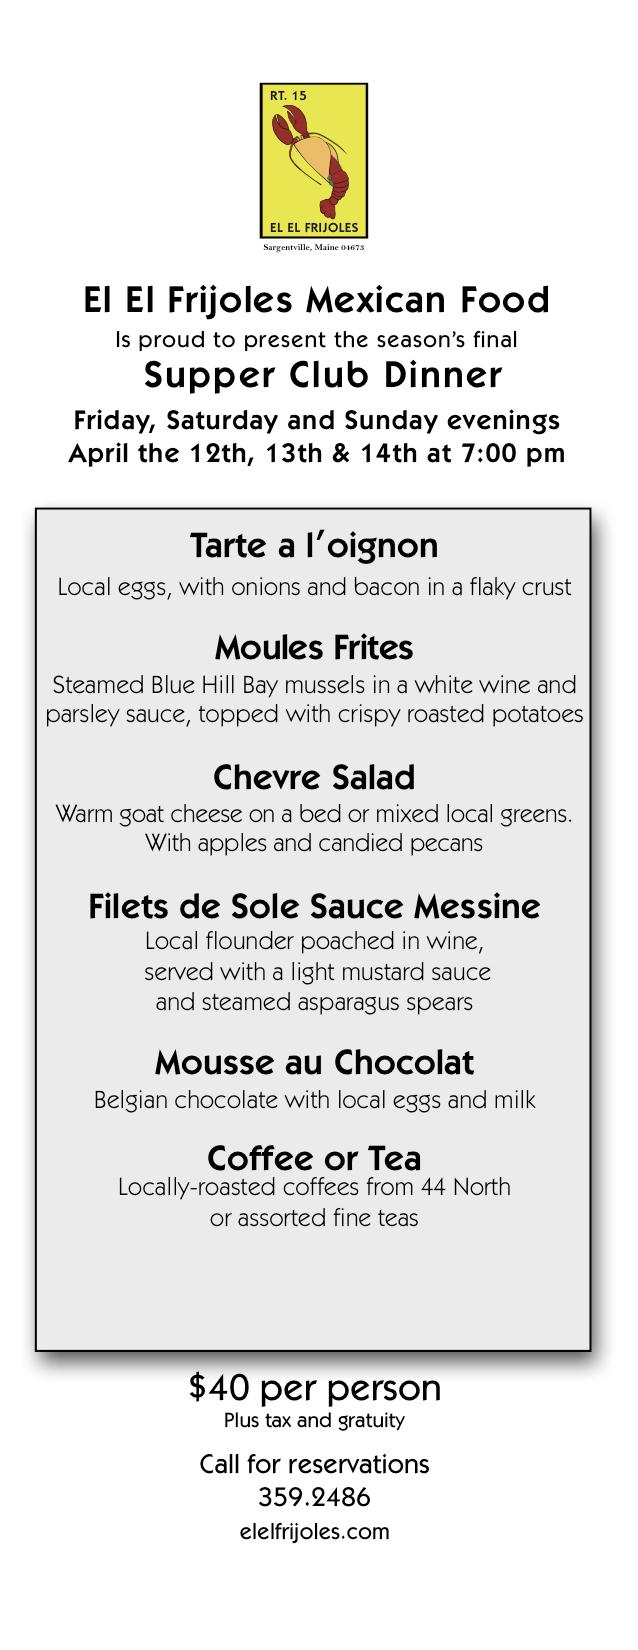 April's menu